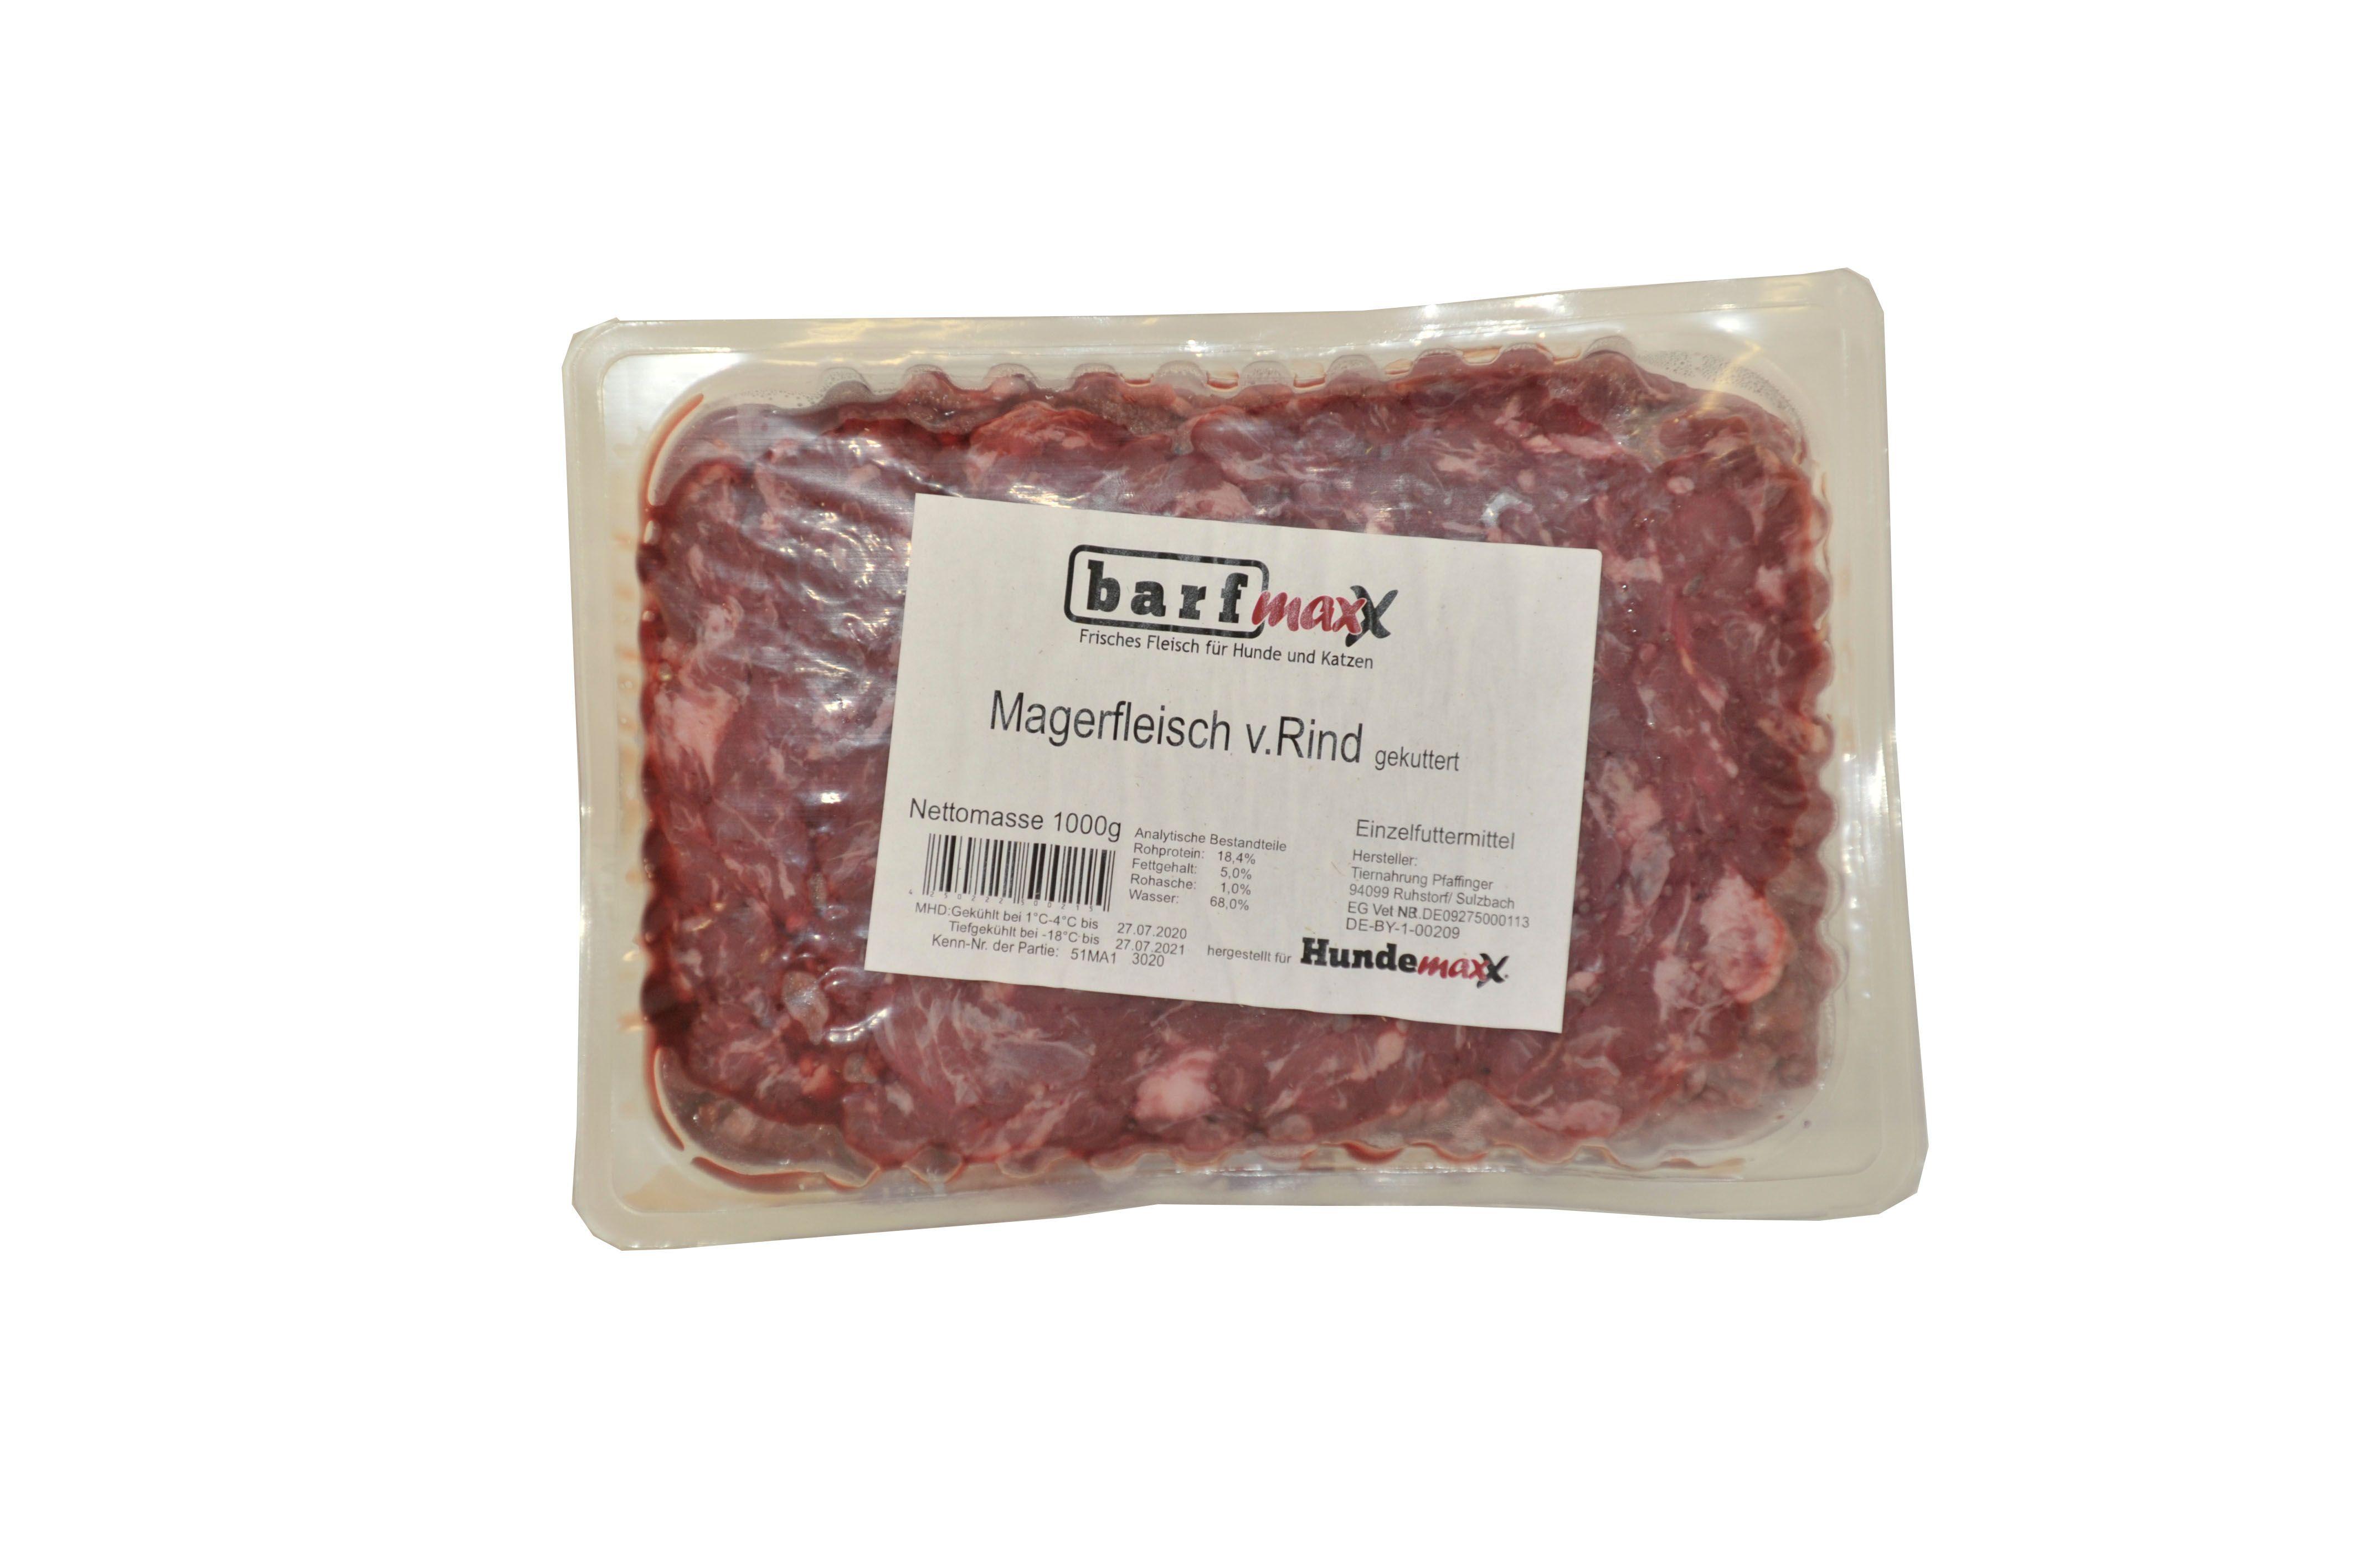 barfmaxx Magerfleisch gekuttert